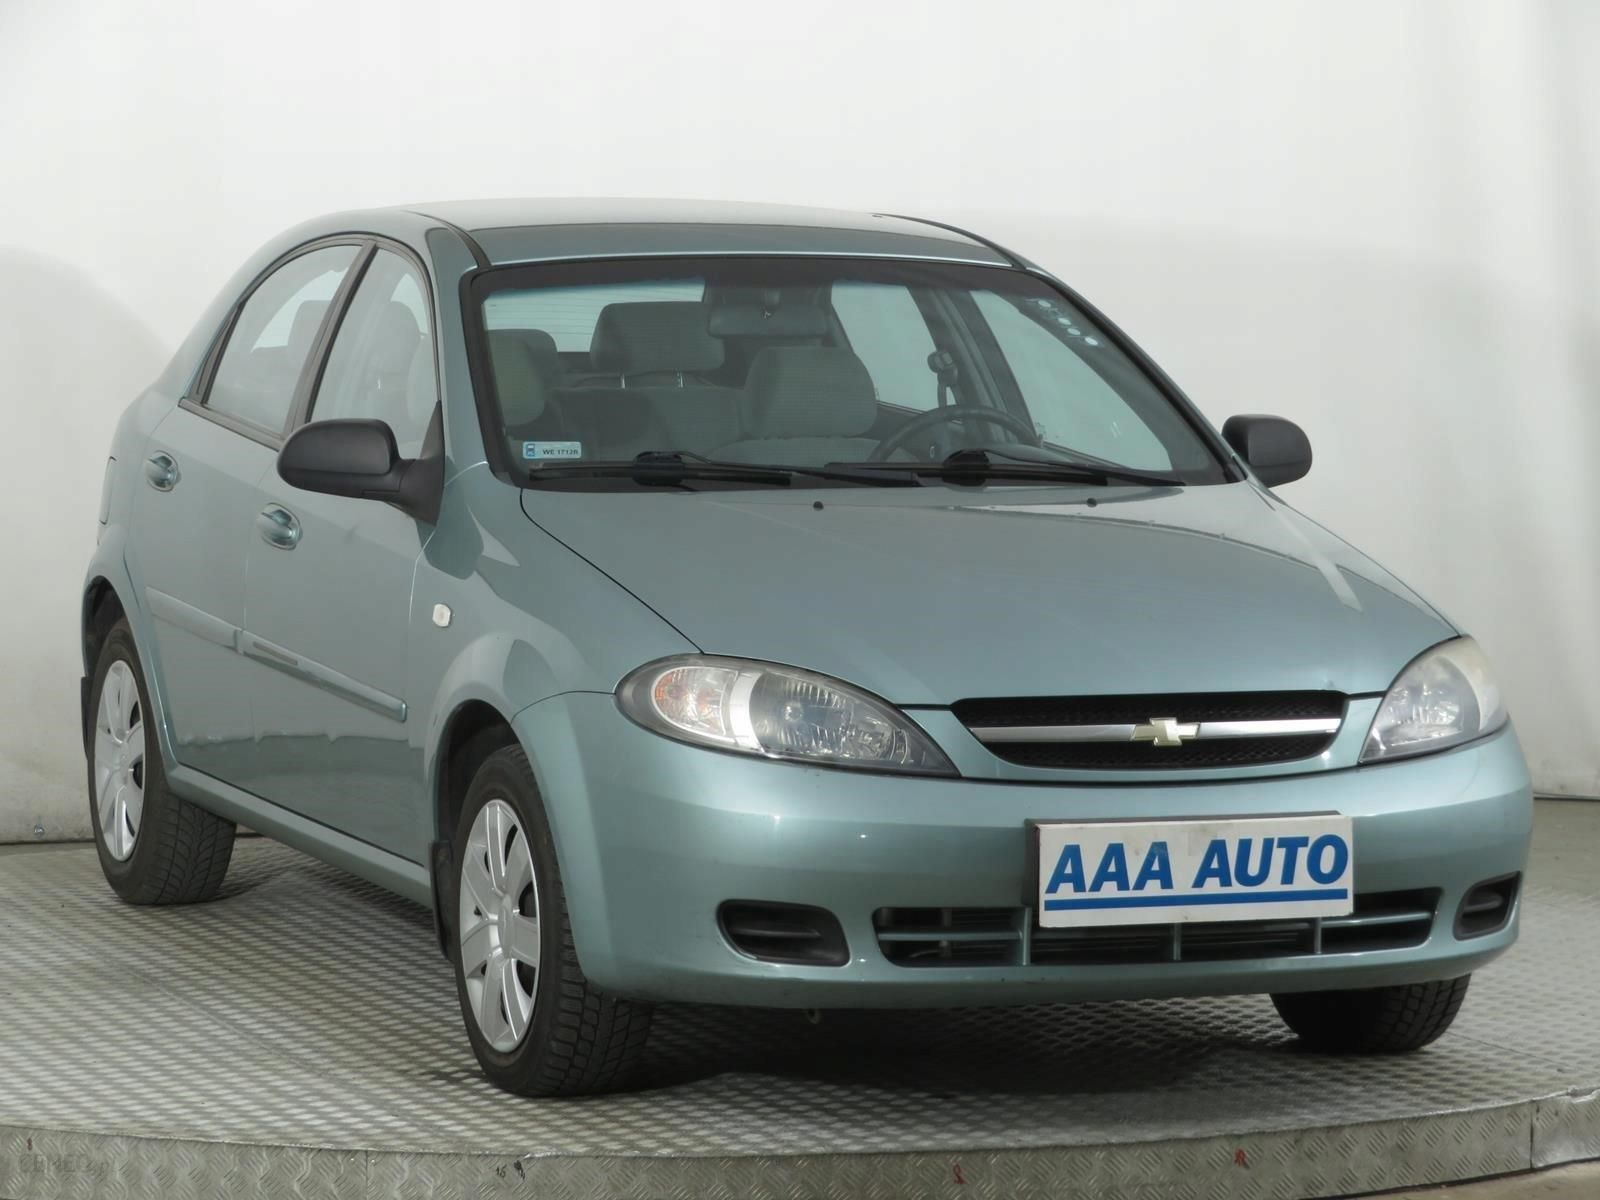 Chevrolet Lacetti 1 4 Salon Polska Opinie I Ceny Na Ceneo Pl